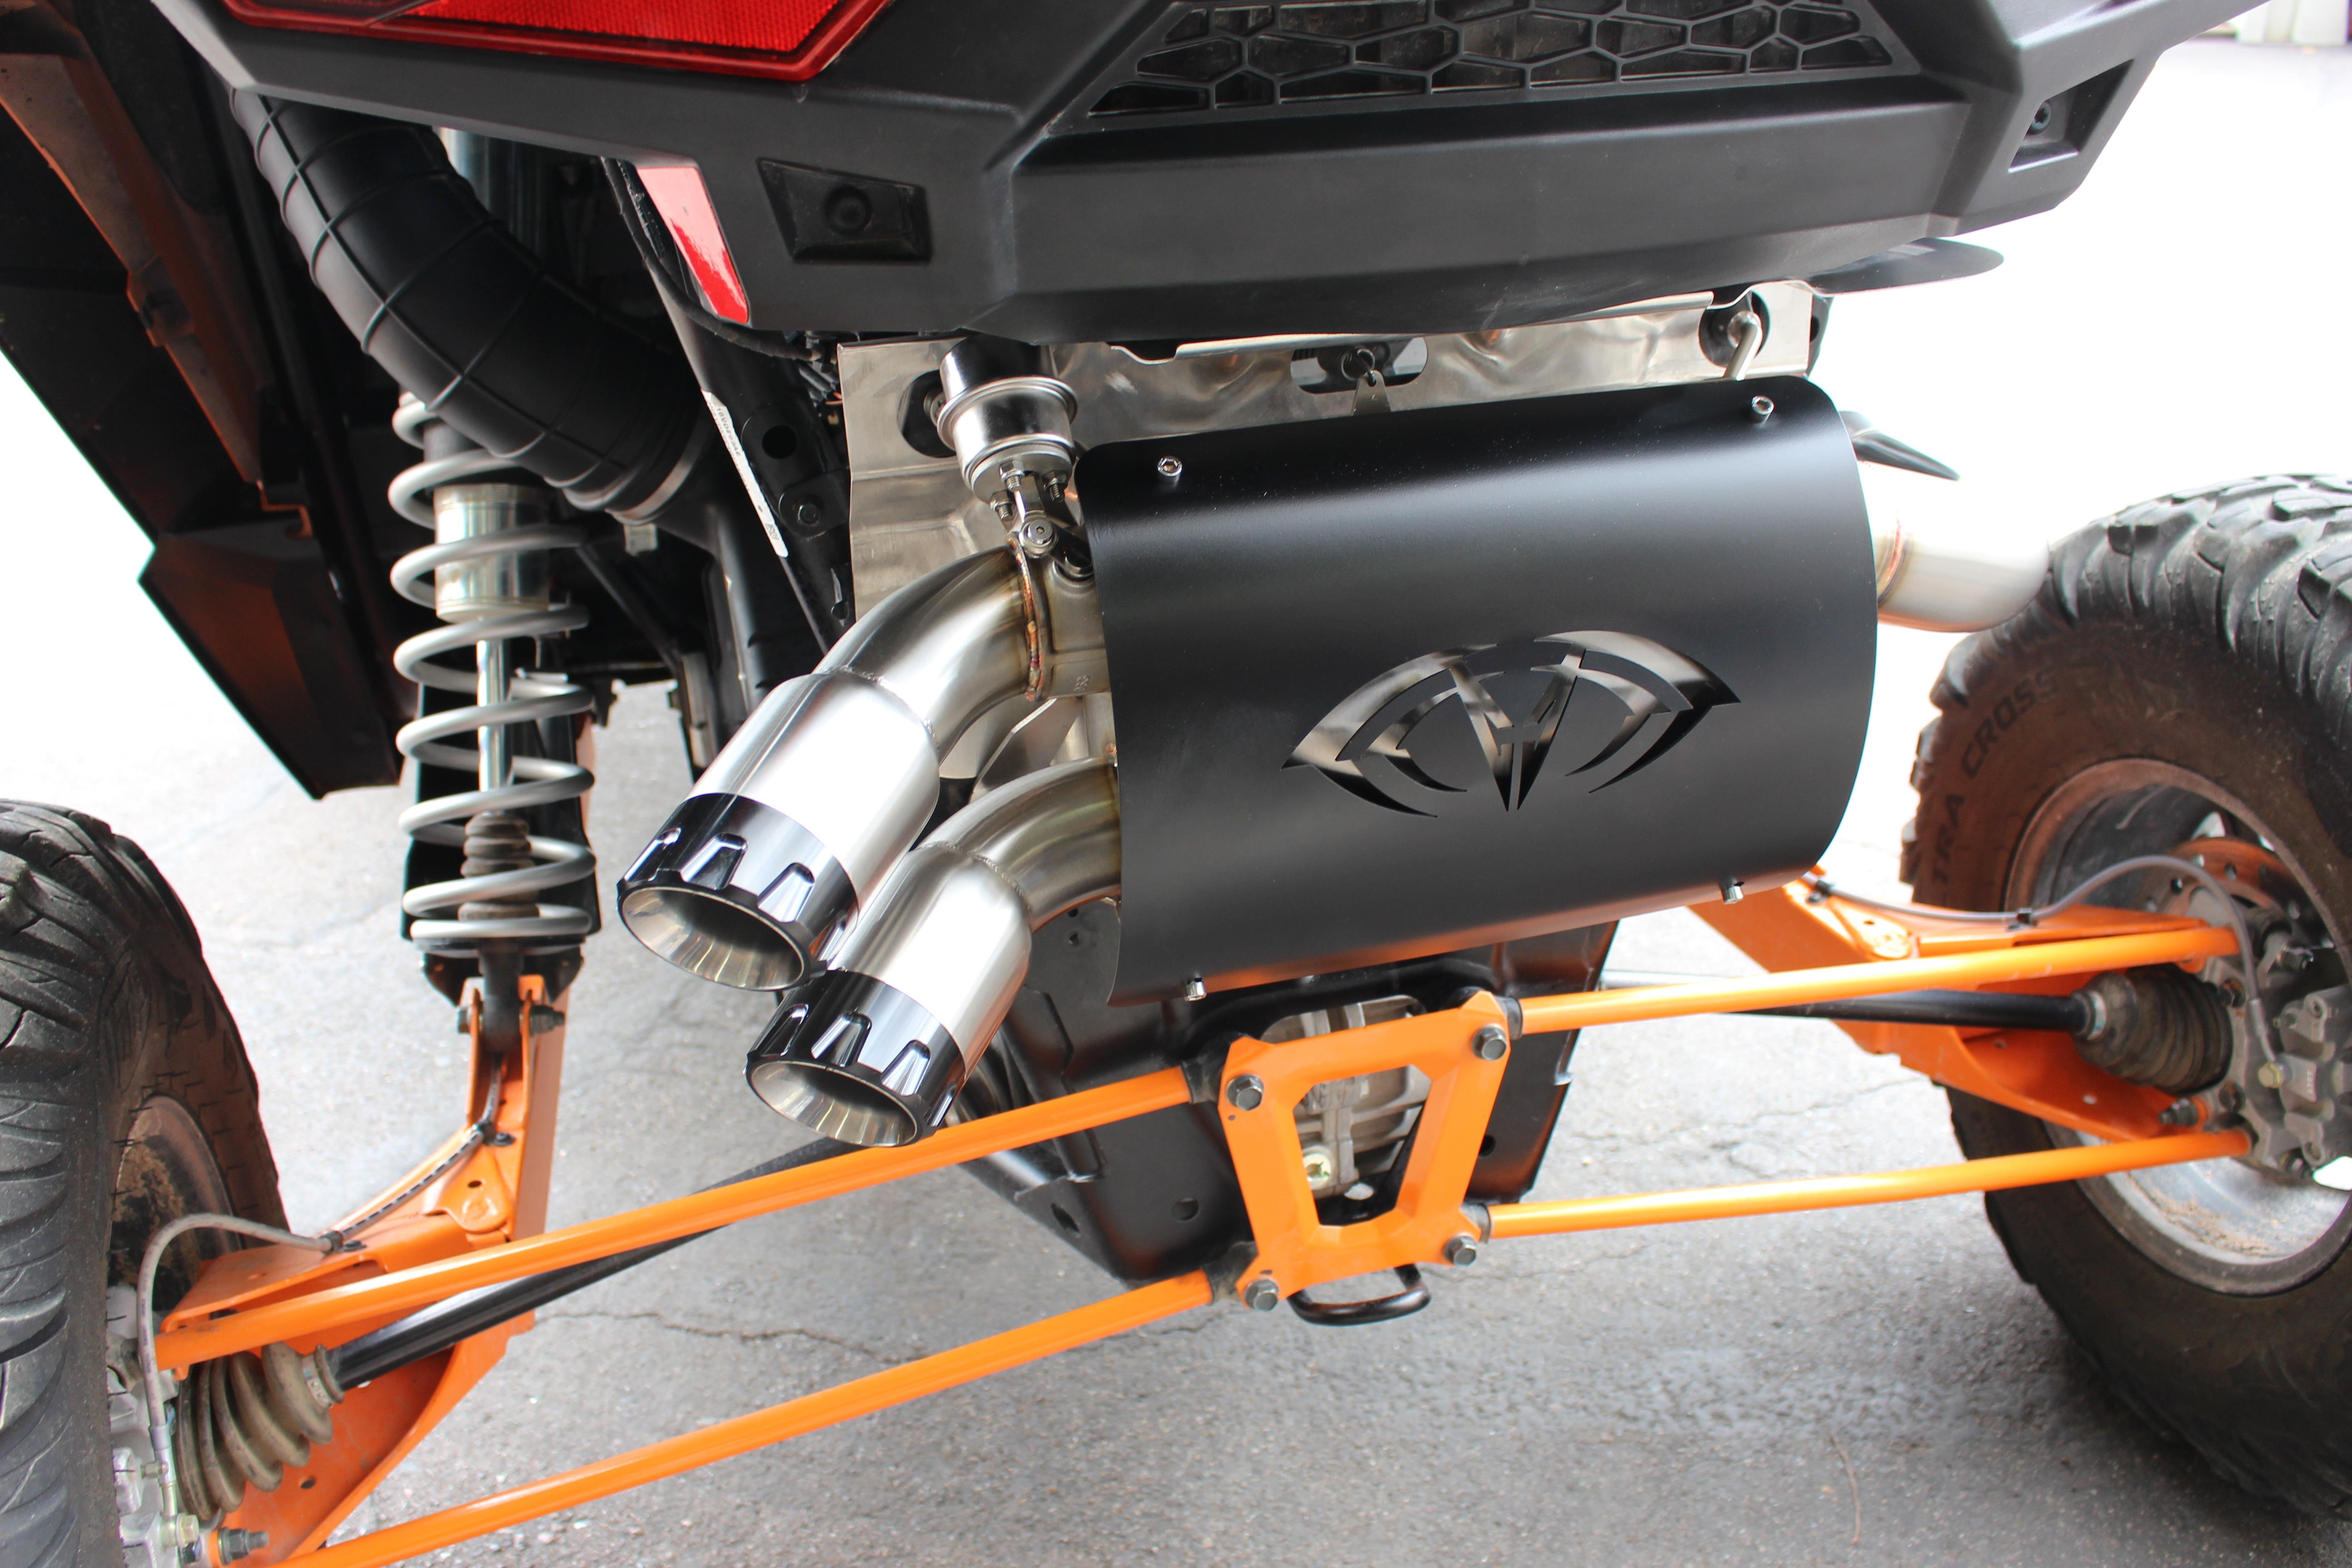 evolution powersports rzr xp turbo captains choice  turbo  cut  exhaust